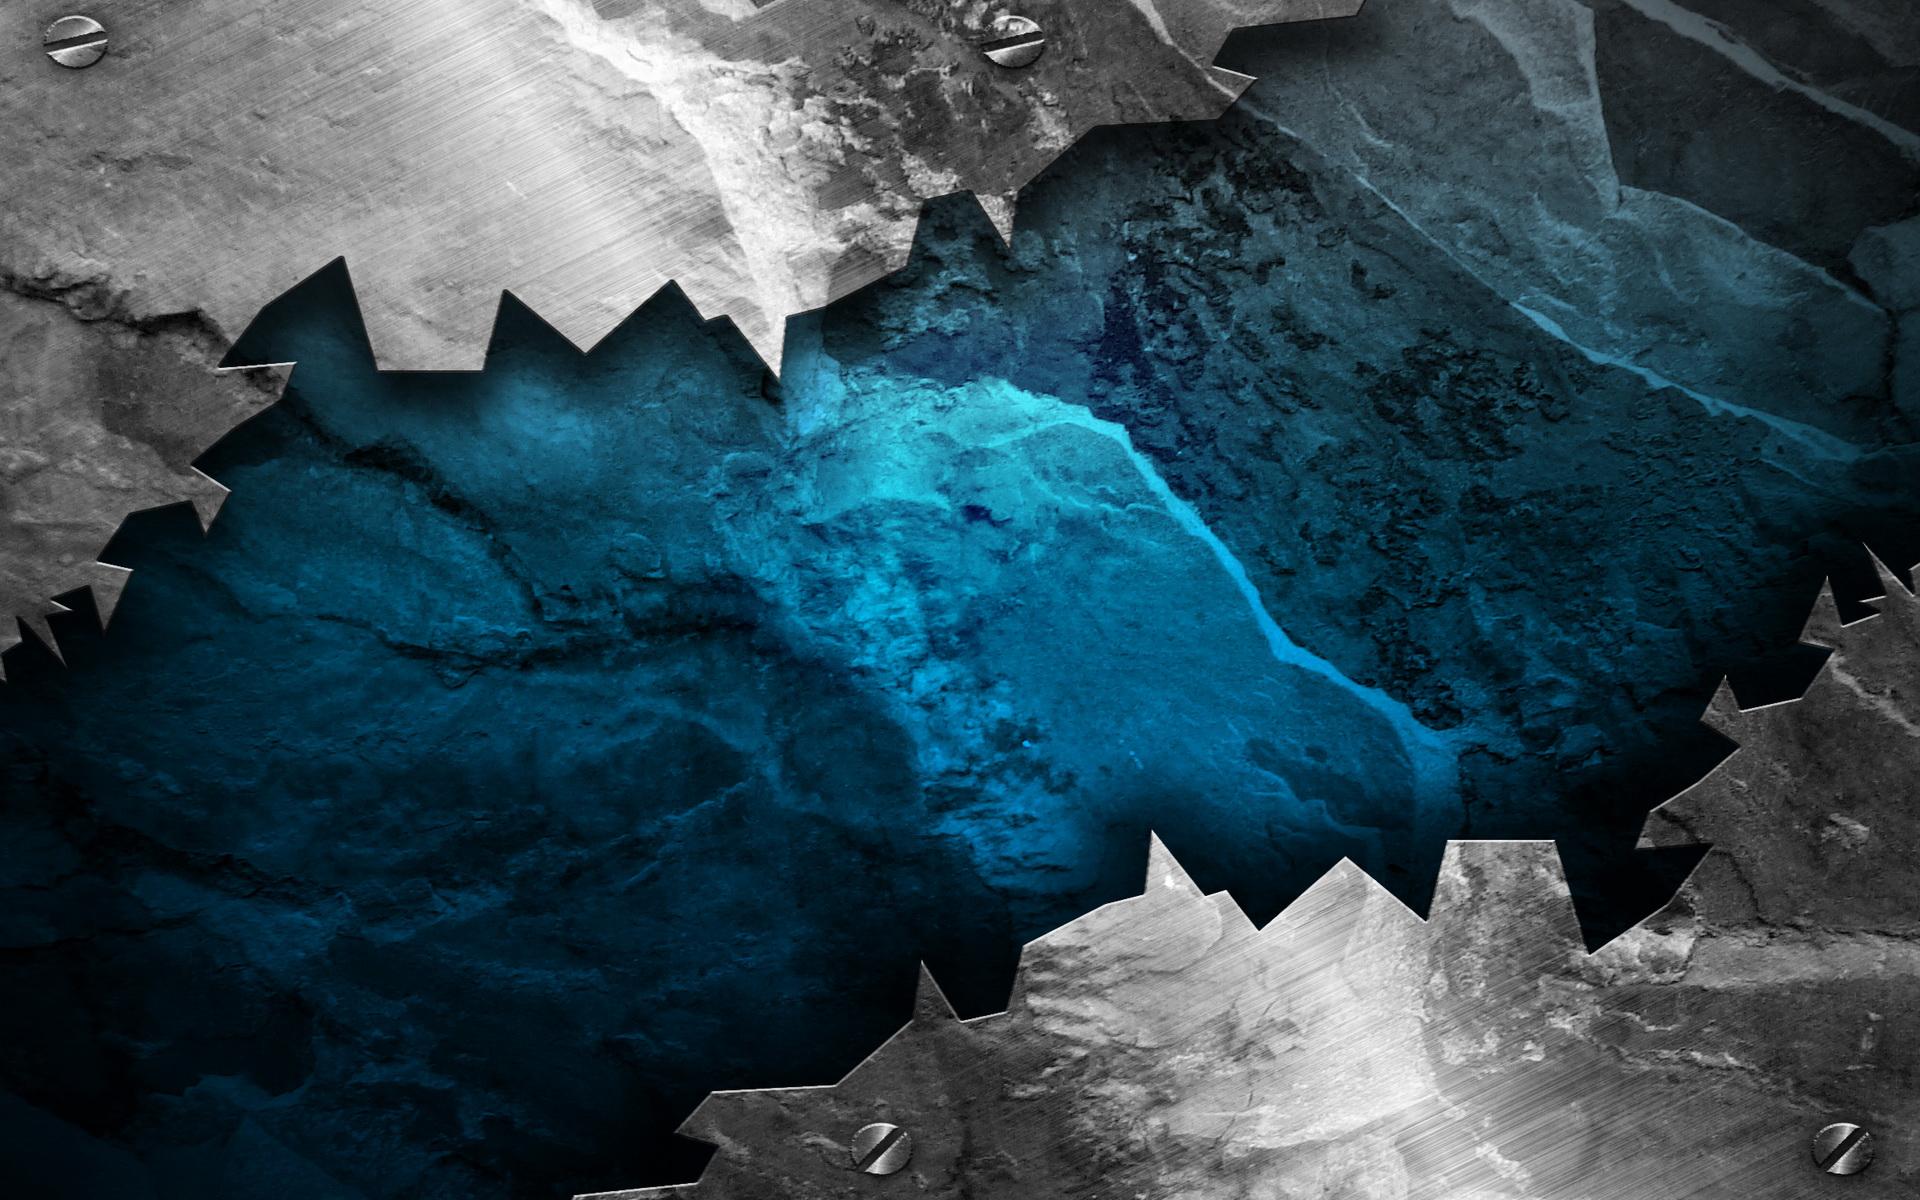 Blue Grunge Wallpaper HD   PixelsTalk.Net